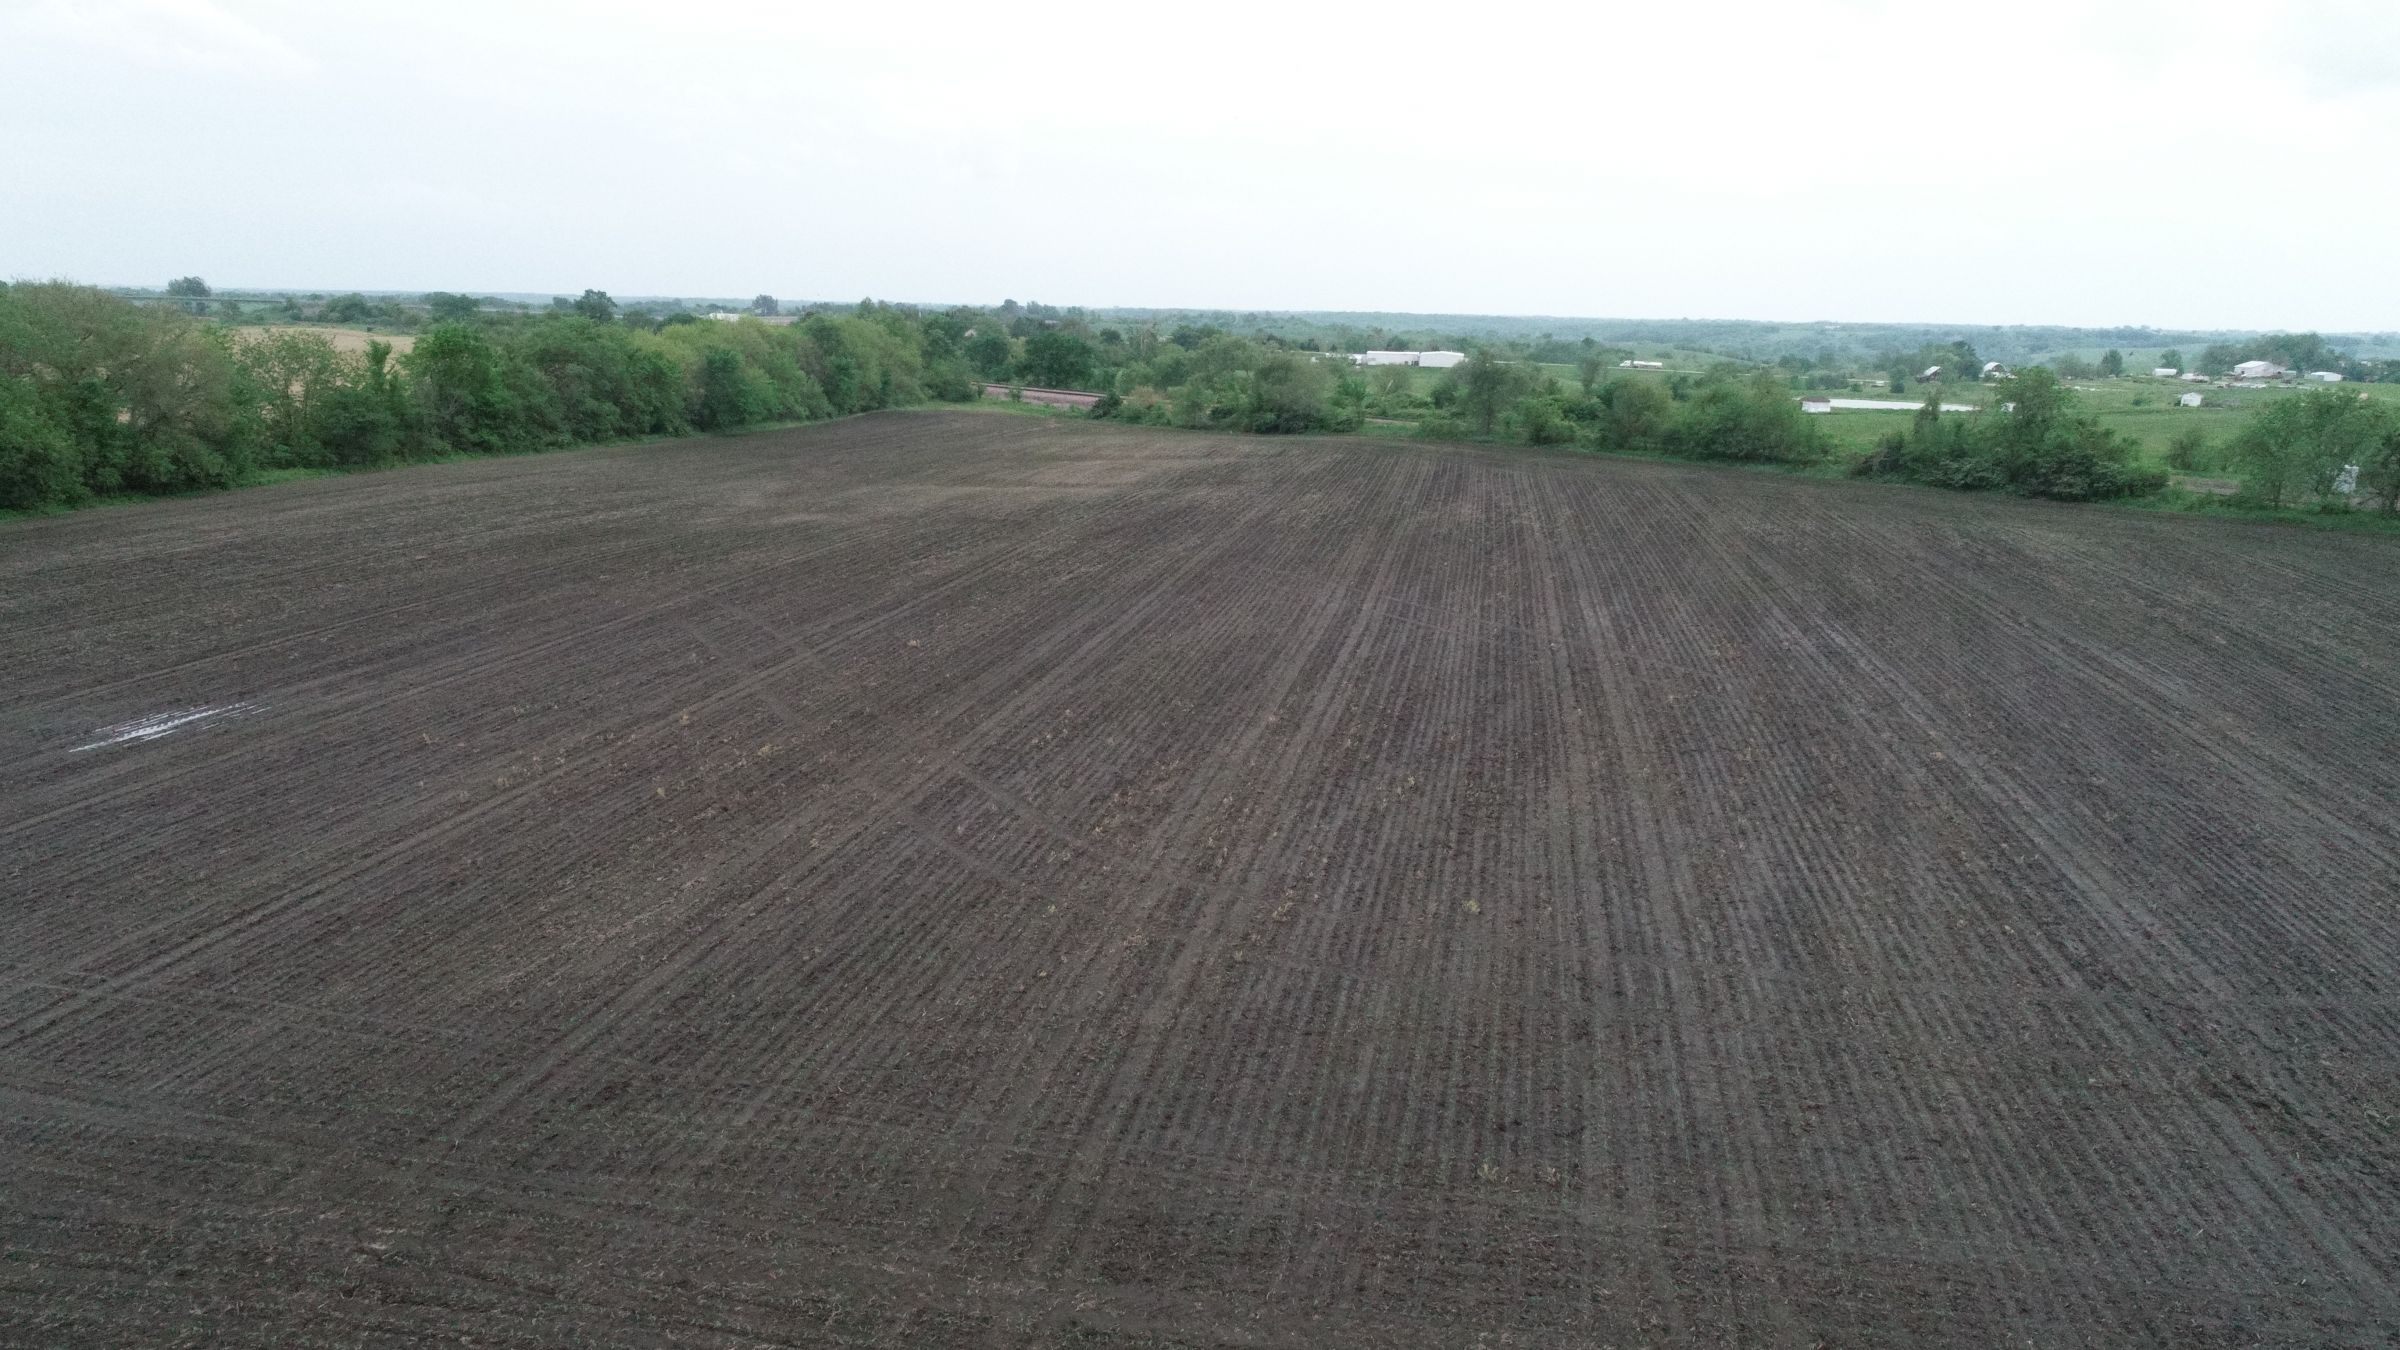 clarke-county-iowa-15-acres-listing-number-15545-0-2021-05-25-145832.JPG